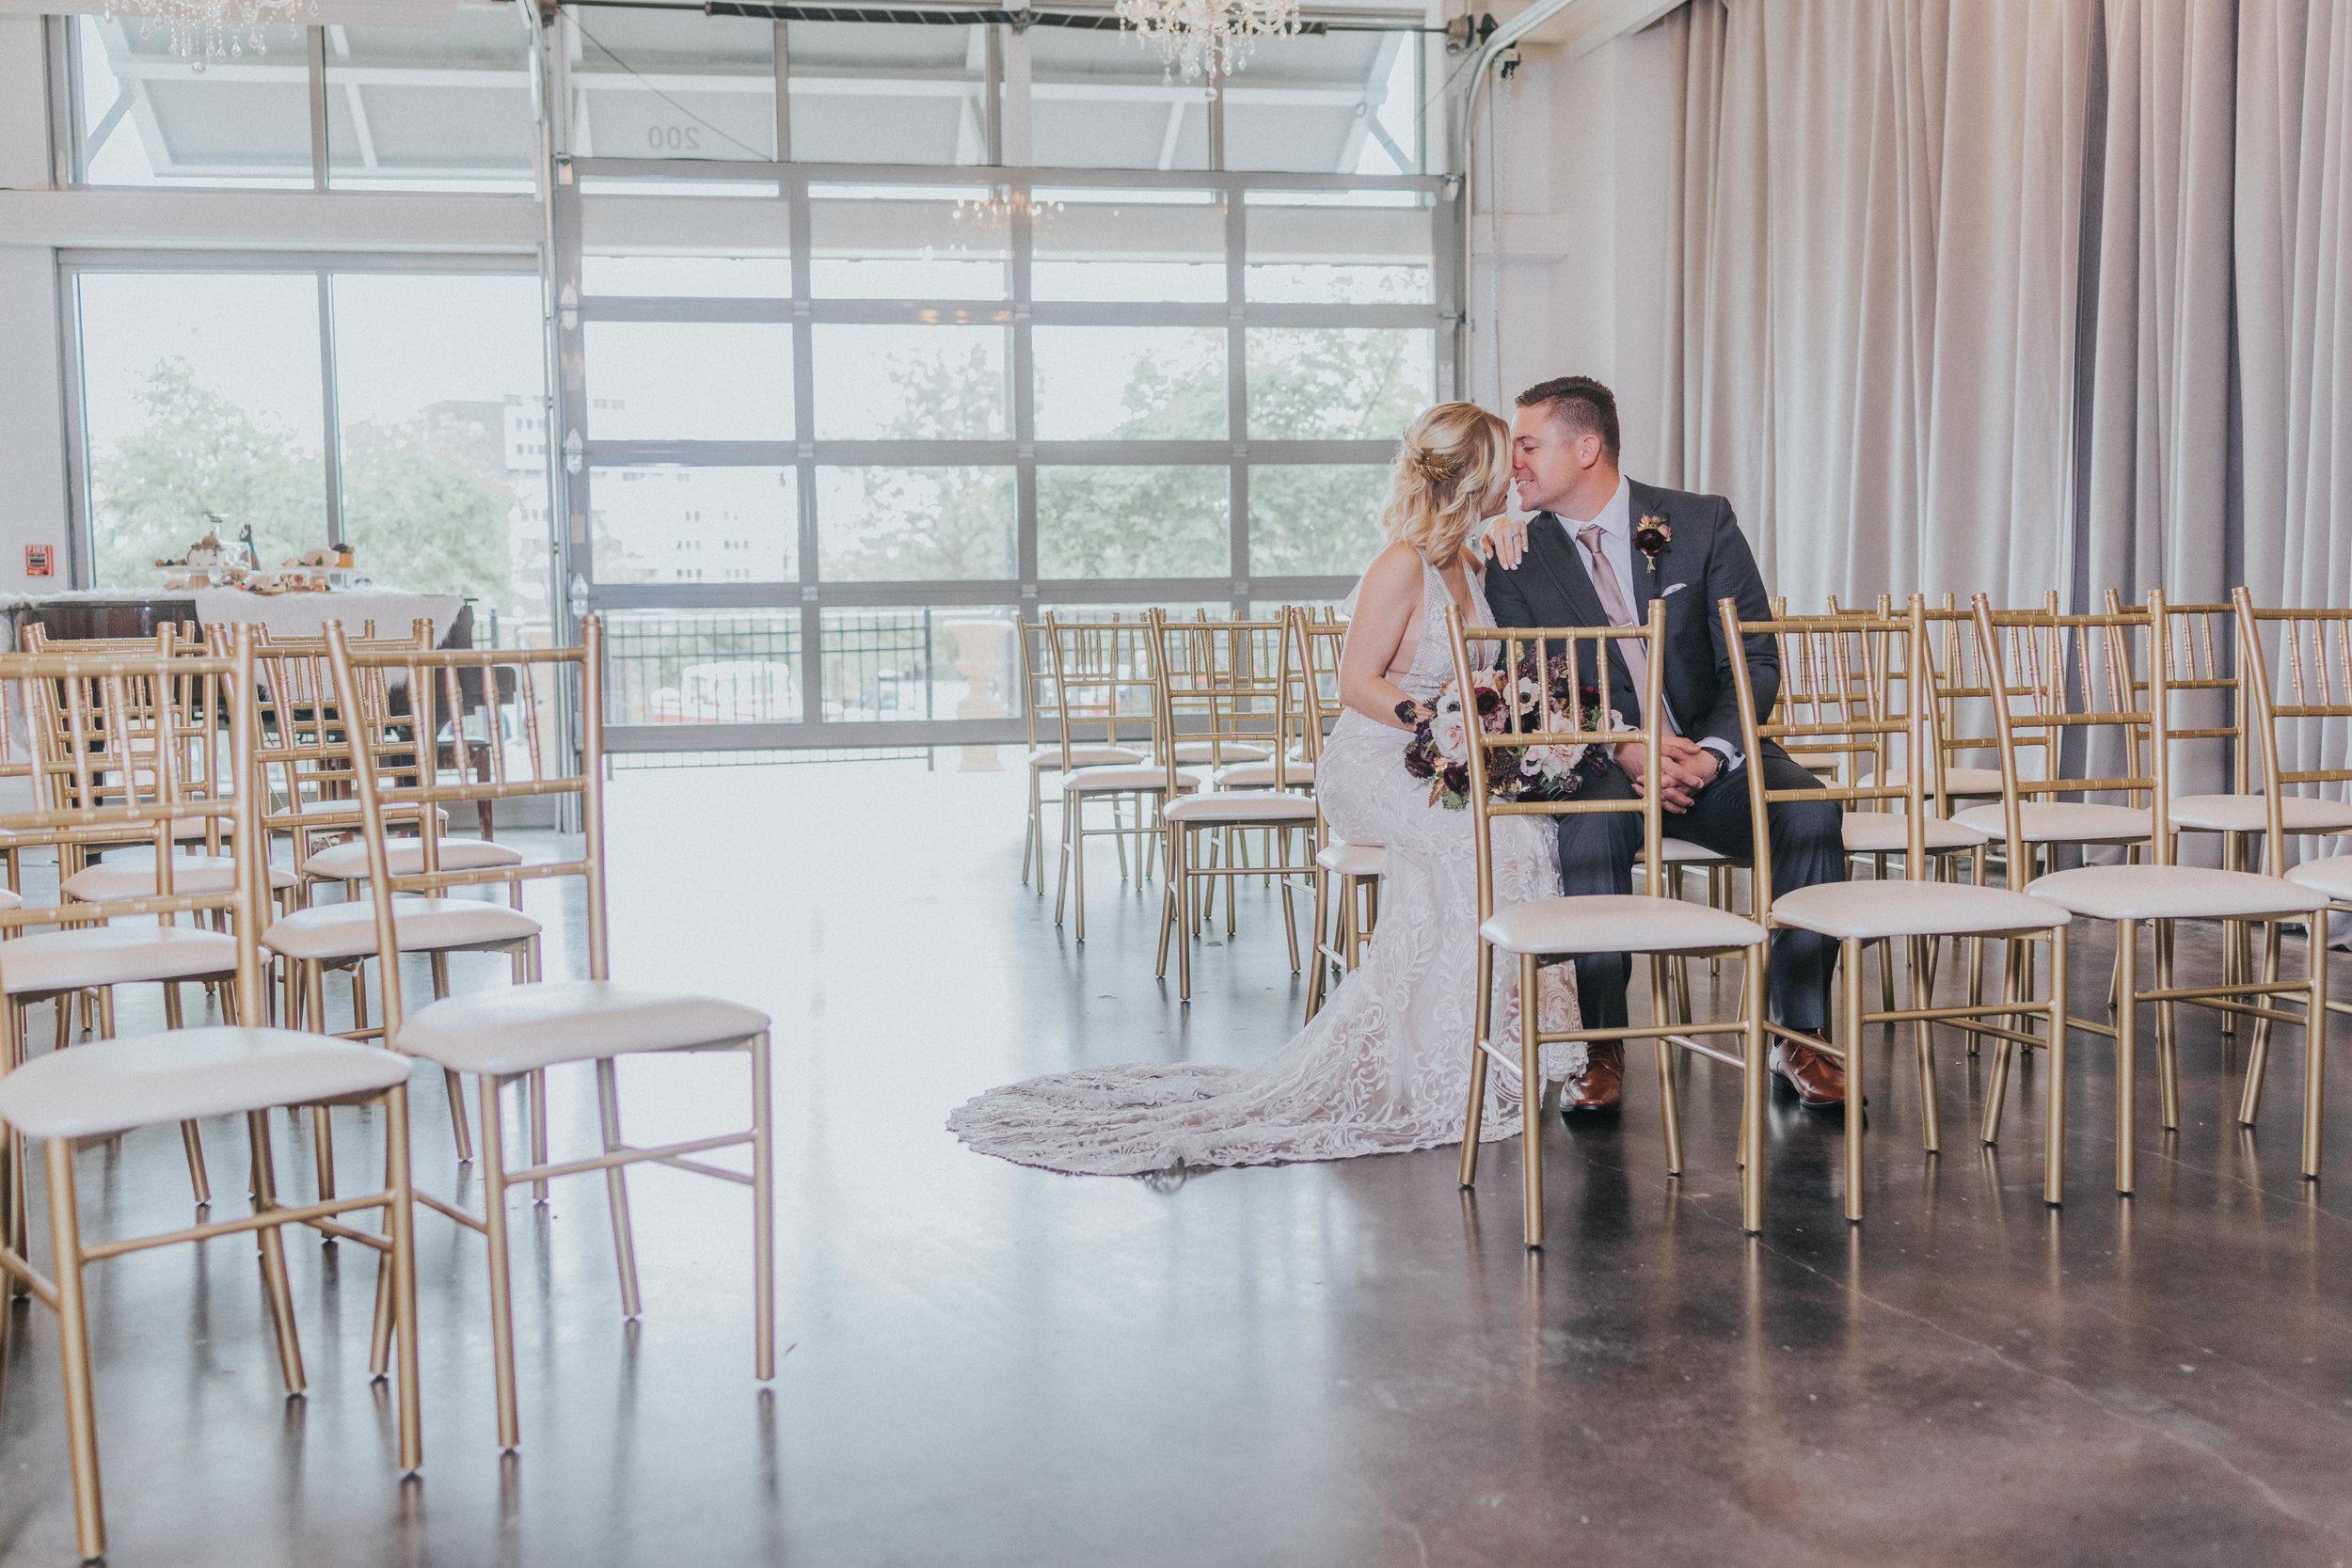 131 tiny-luxe-weddings-omaha-nebraska-midwest-empire-room.jpg